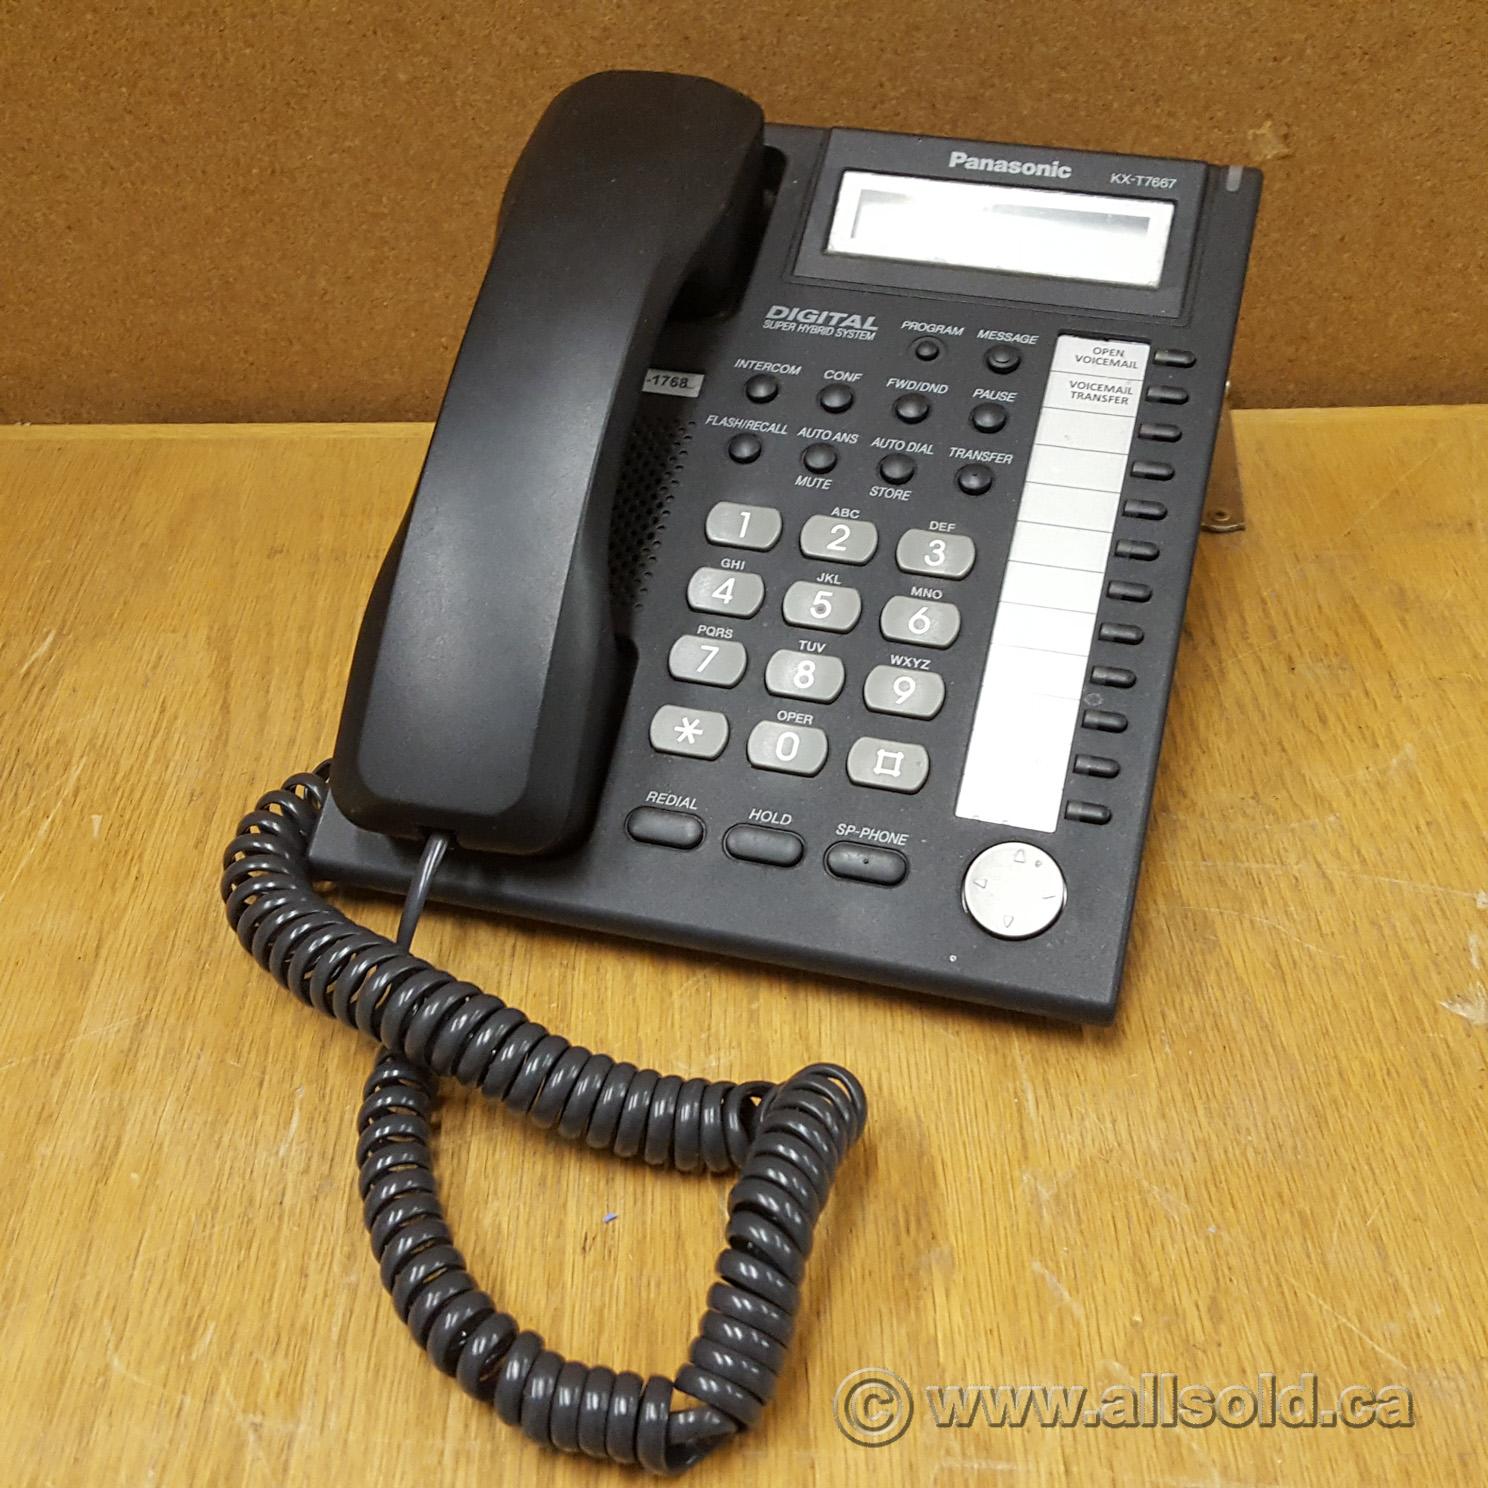 Panasonic Kx T7667 Black Lcd Digital Speakerphone